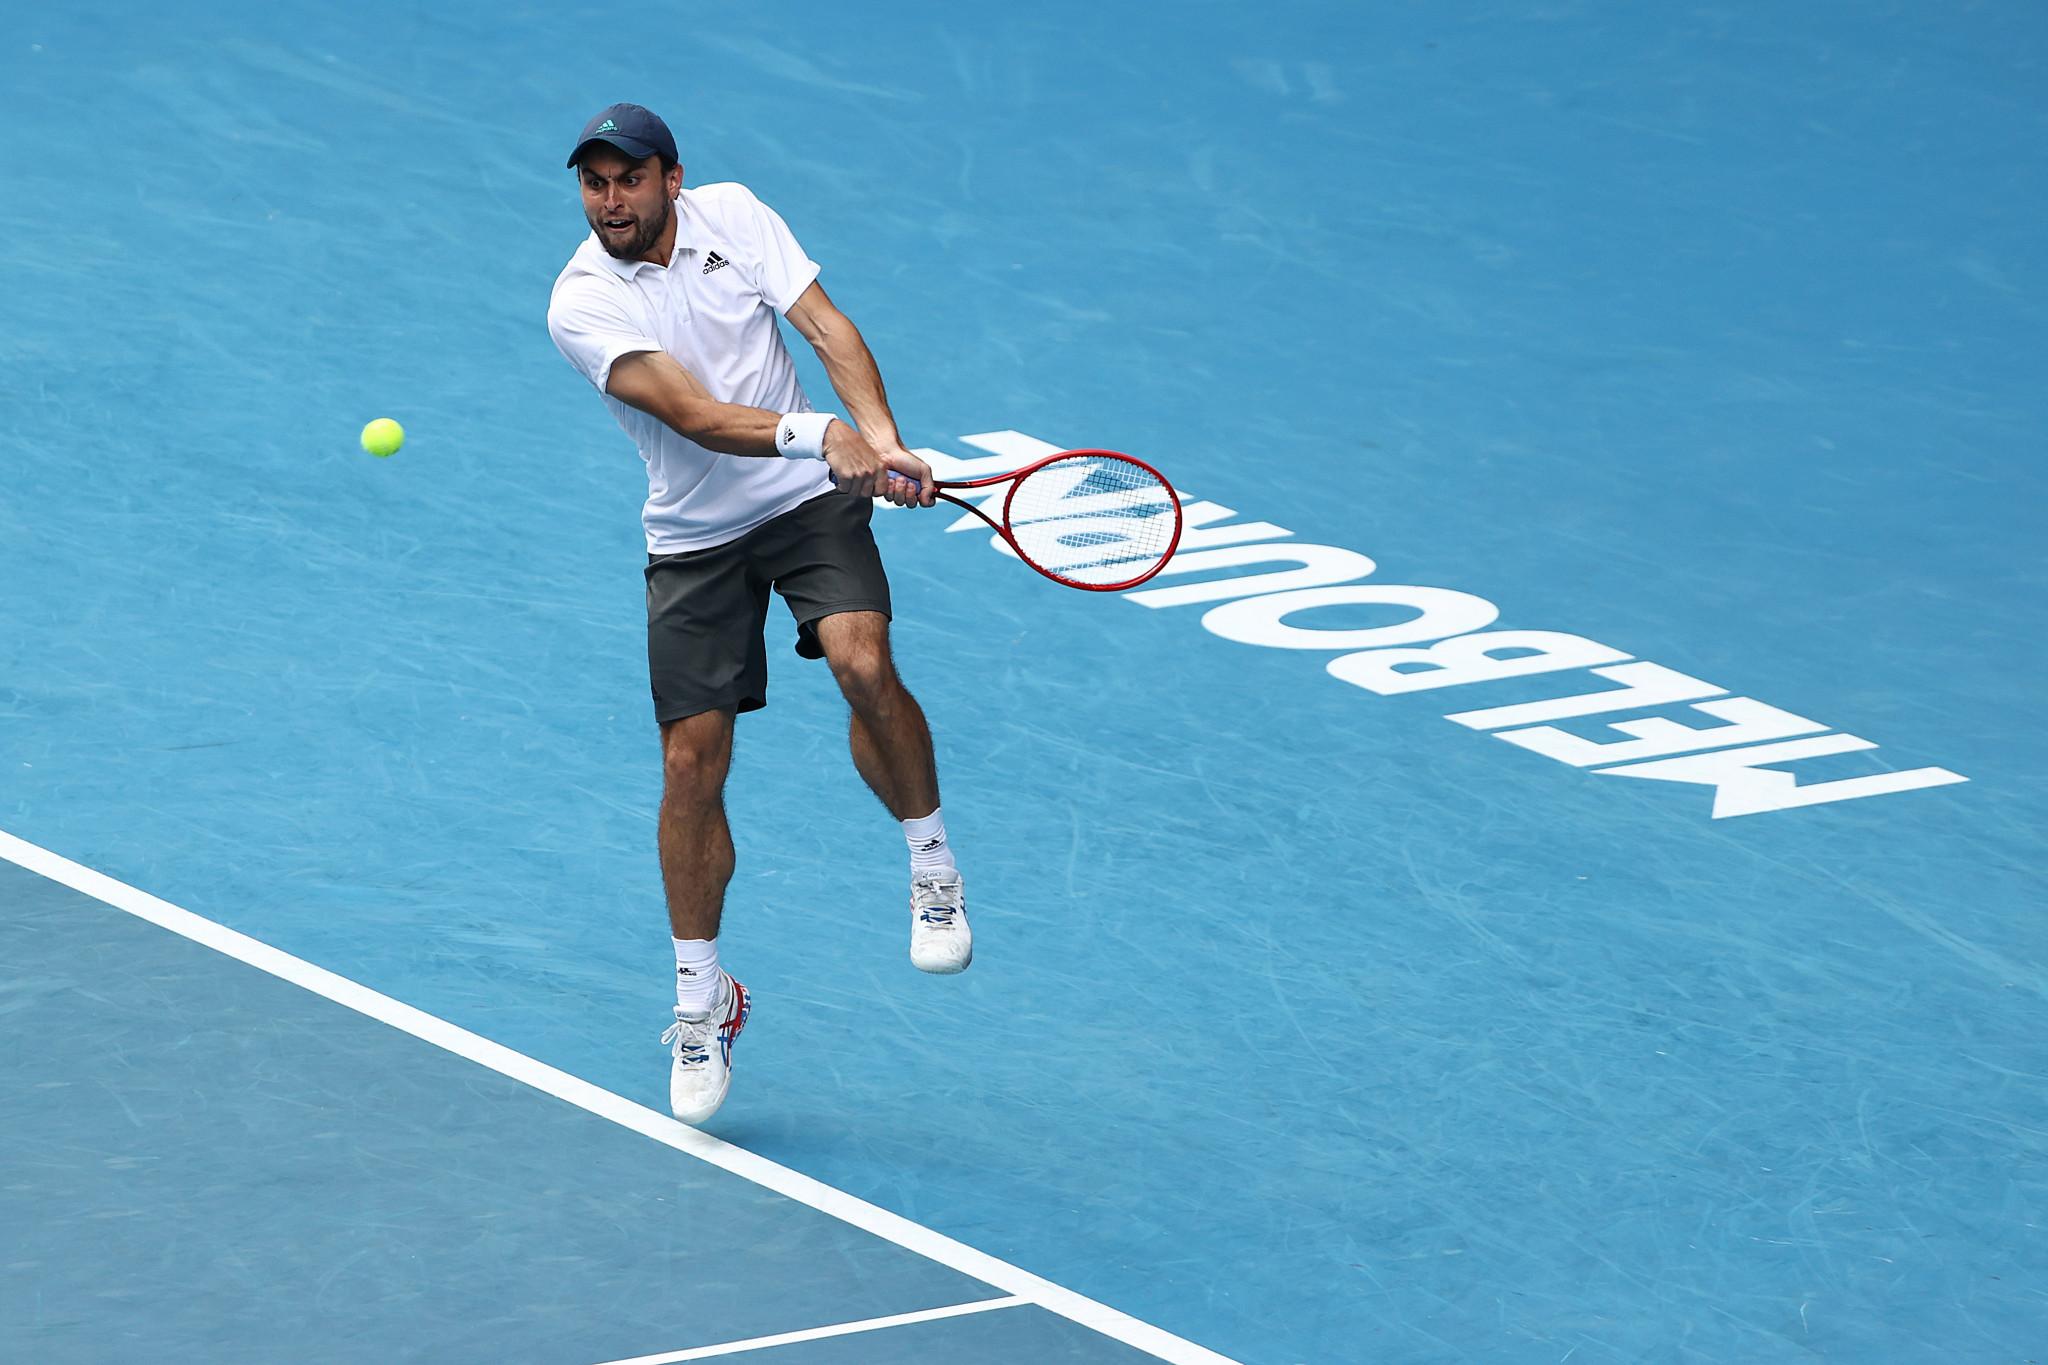 Djokovic's next opponent will be Russia's Aslan Karatsev ©Getty Images